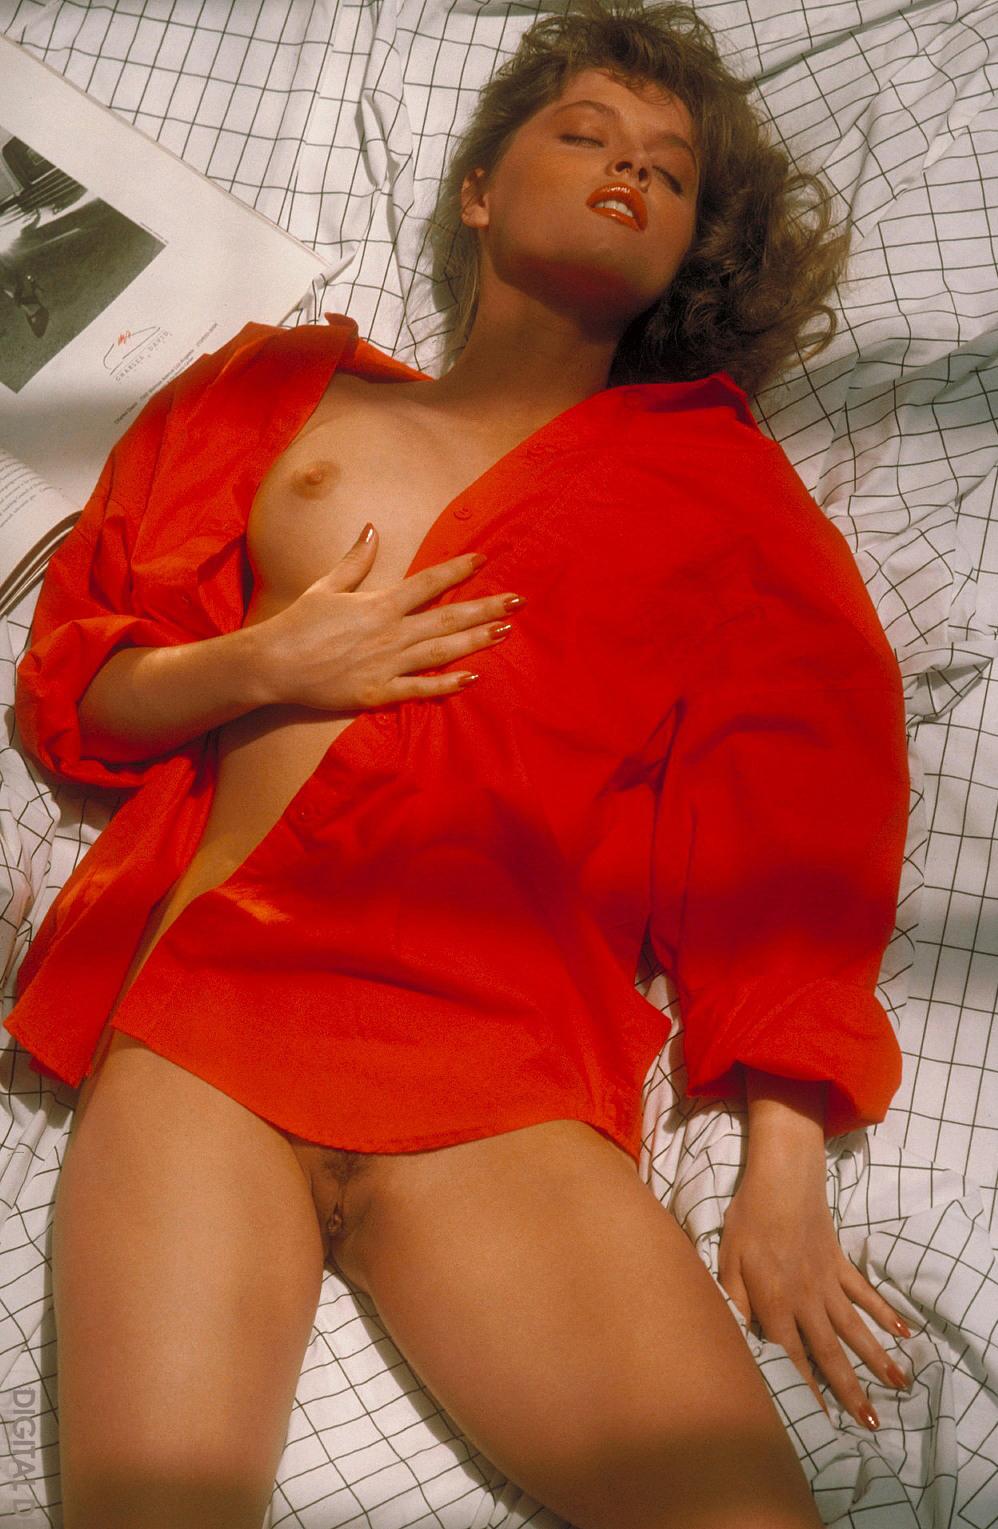 90s Porn star Lori Michaels 26.jpg